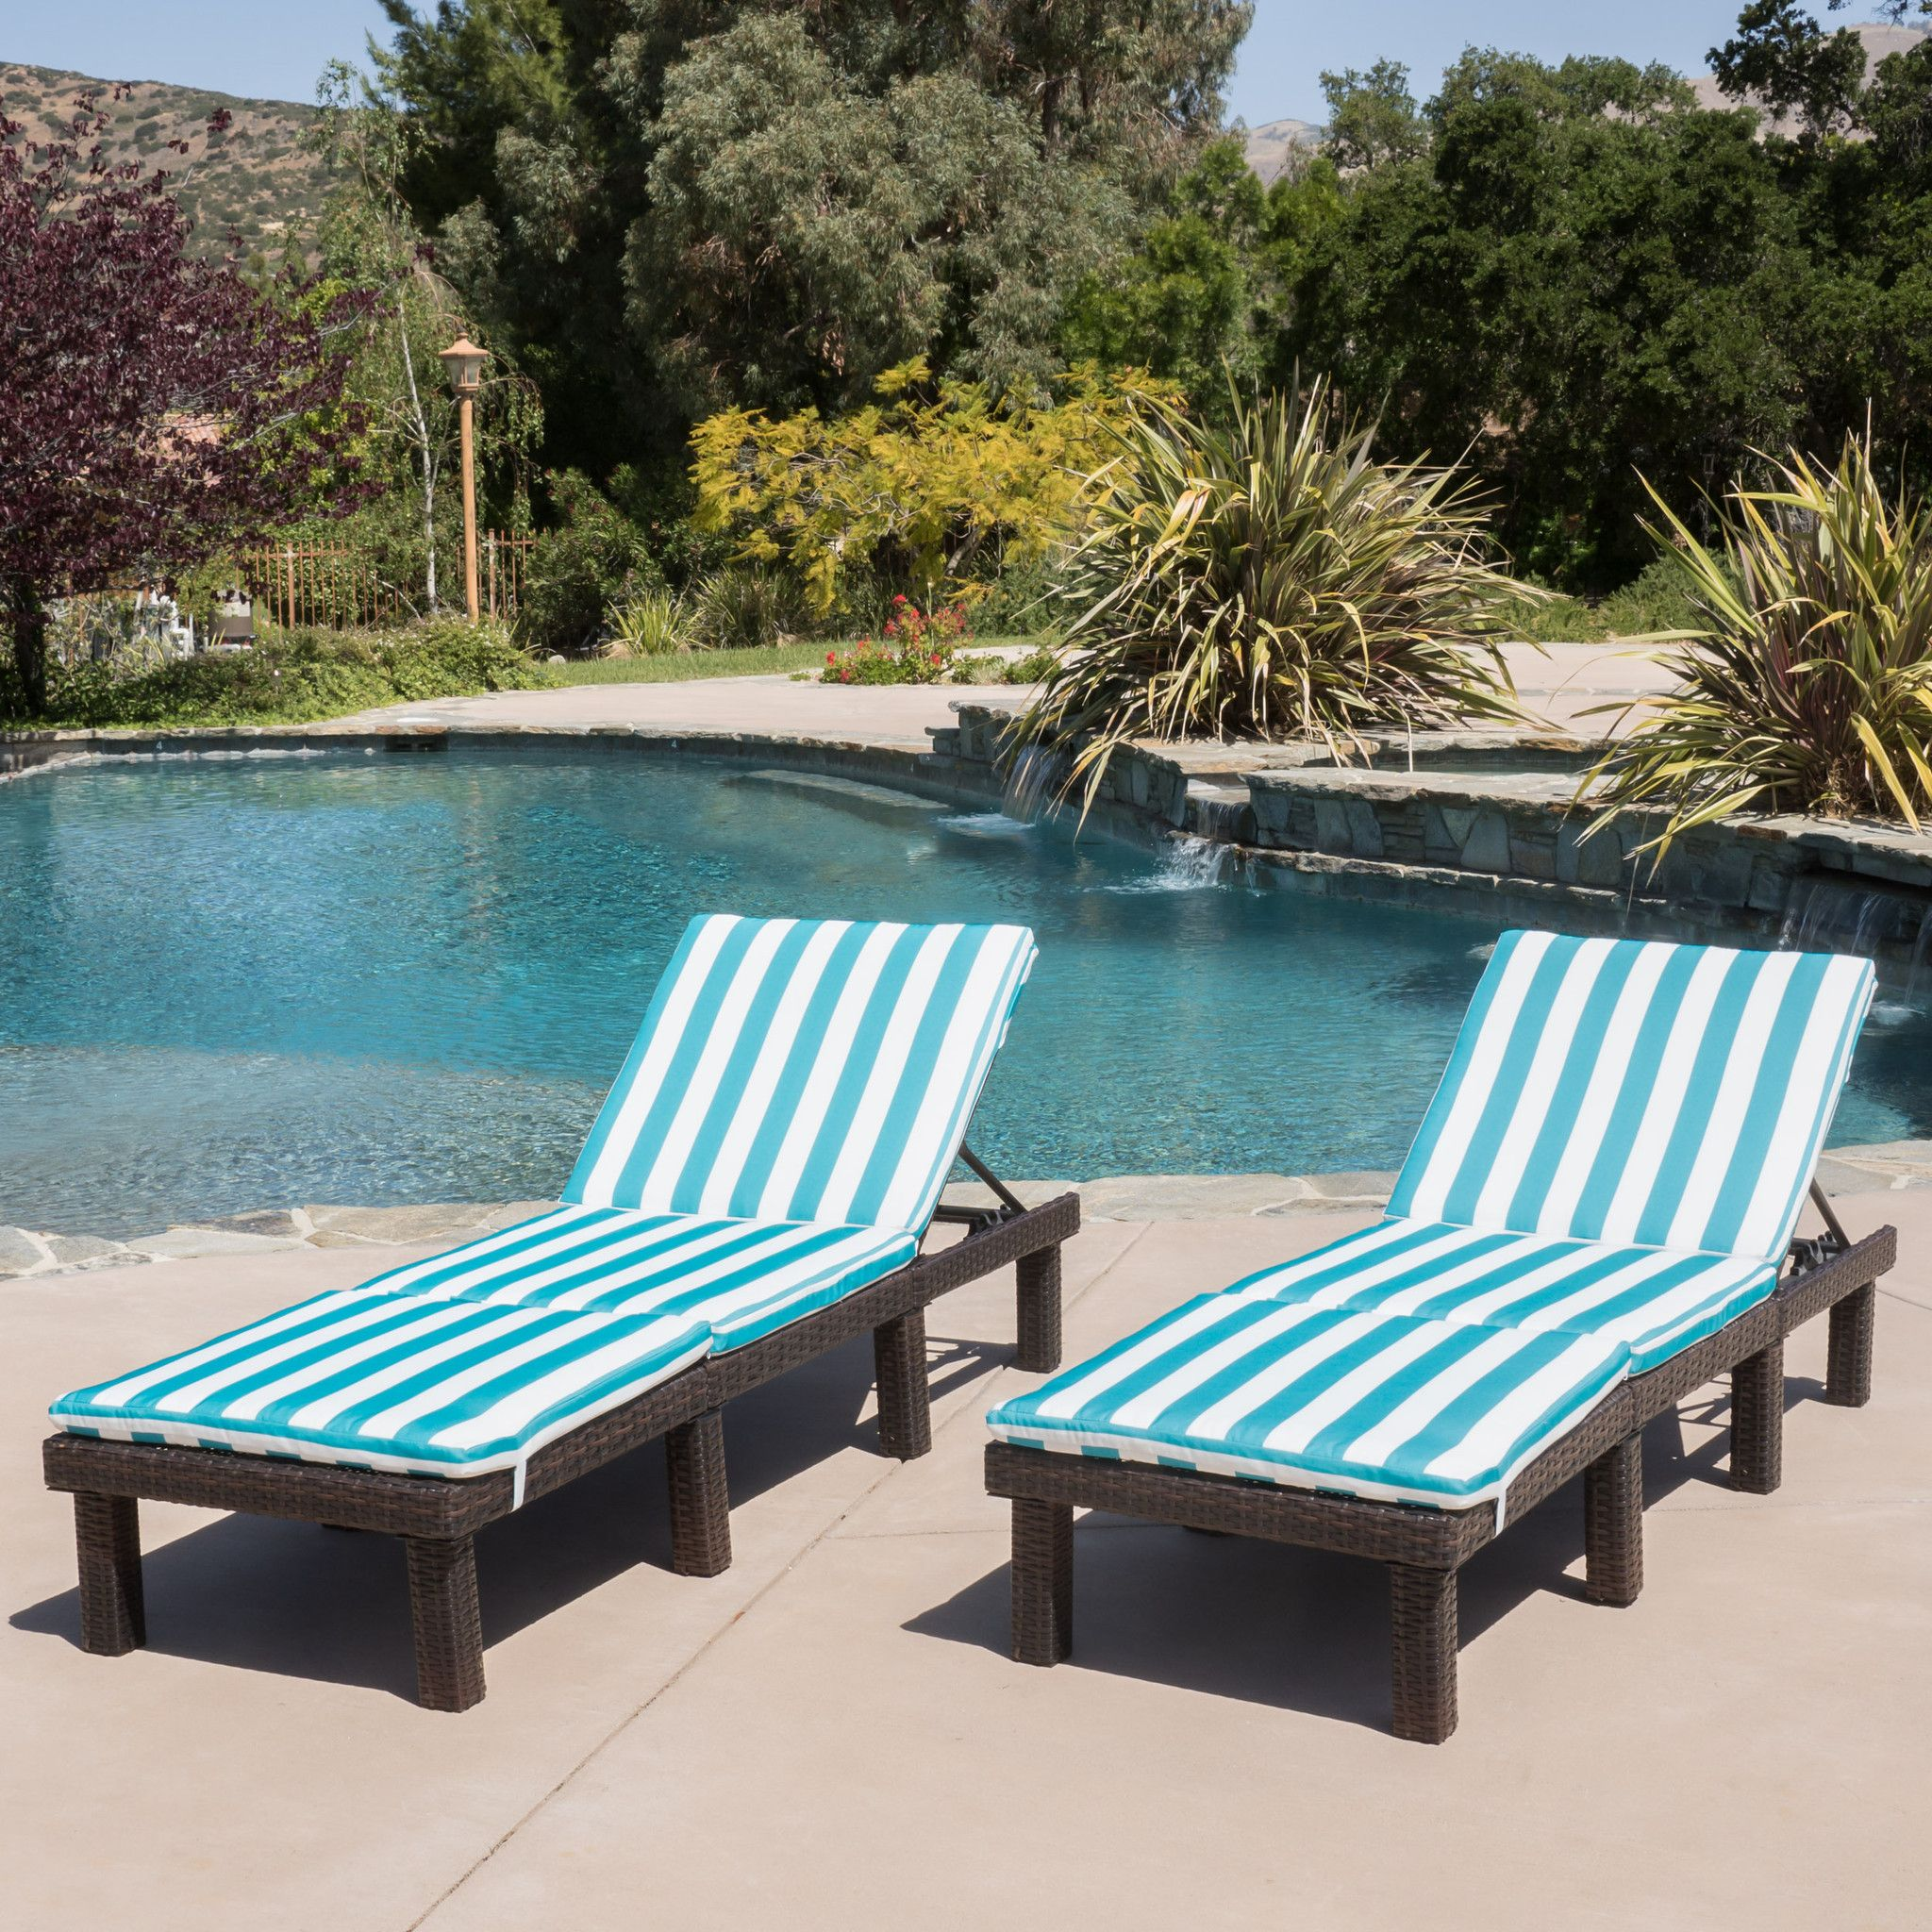 - Estrella Brown Wicker Blue Stripe Adjustable Chaise Lounge Chairs